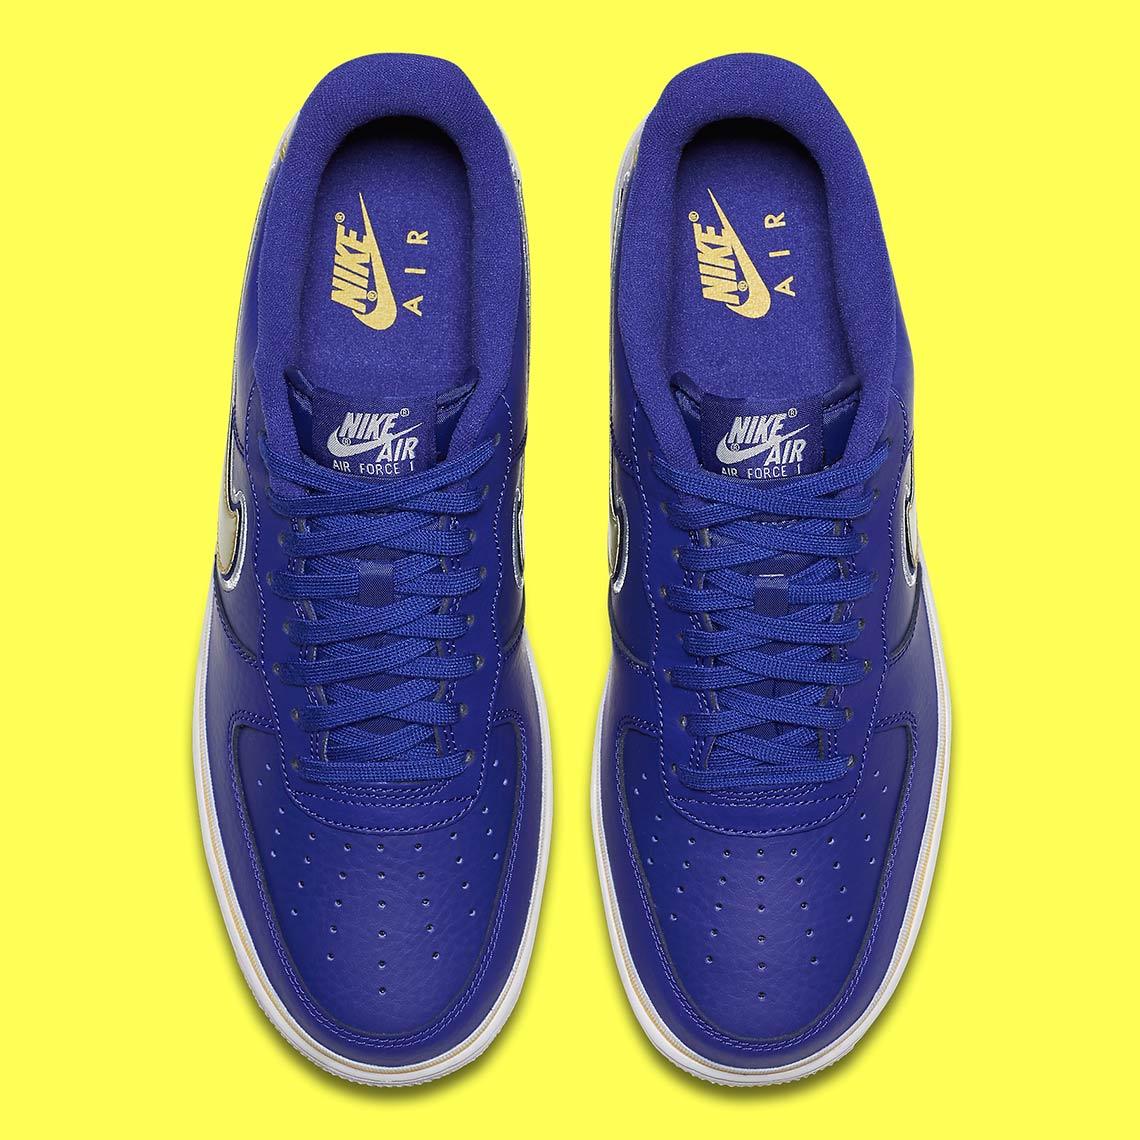 Warriors X Air Jordan 1: The Golden State Warriors Get Their Own Nike Air Force 1